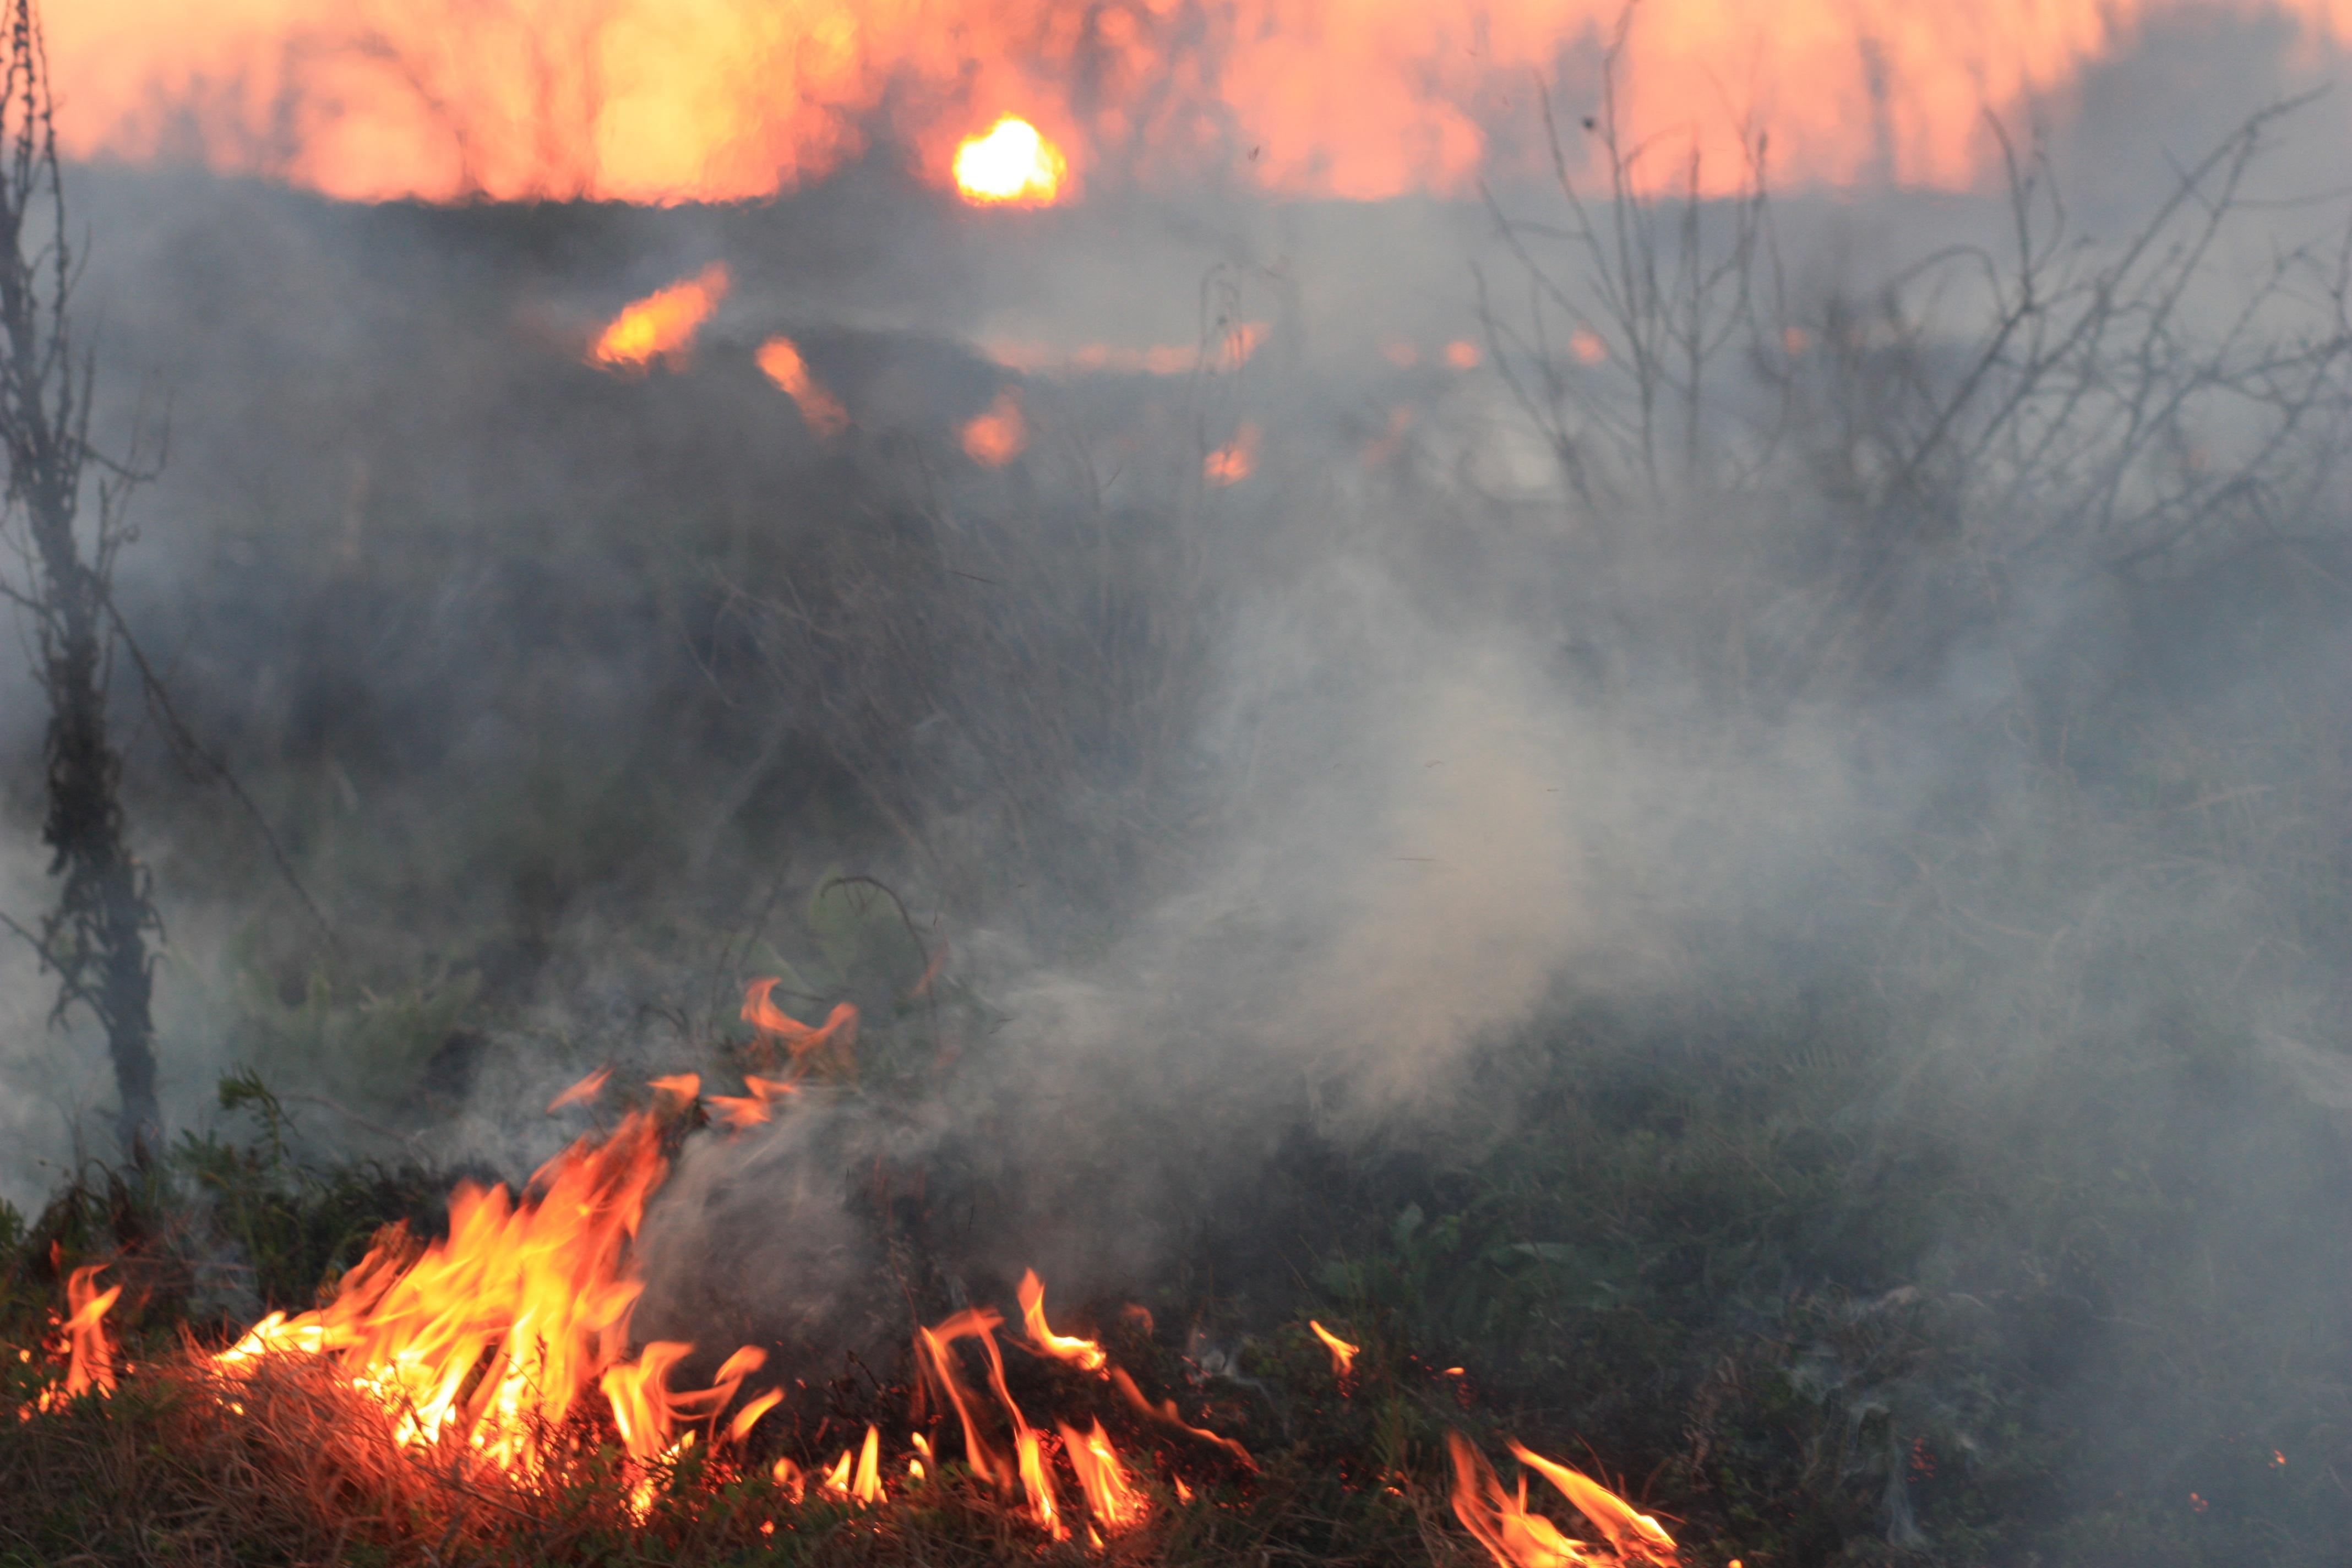 Nature, Fire, Forest, Hot, Jungle, HQ Photo